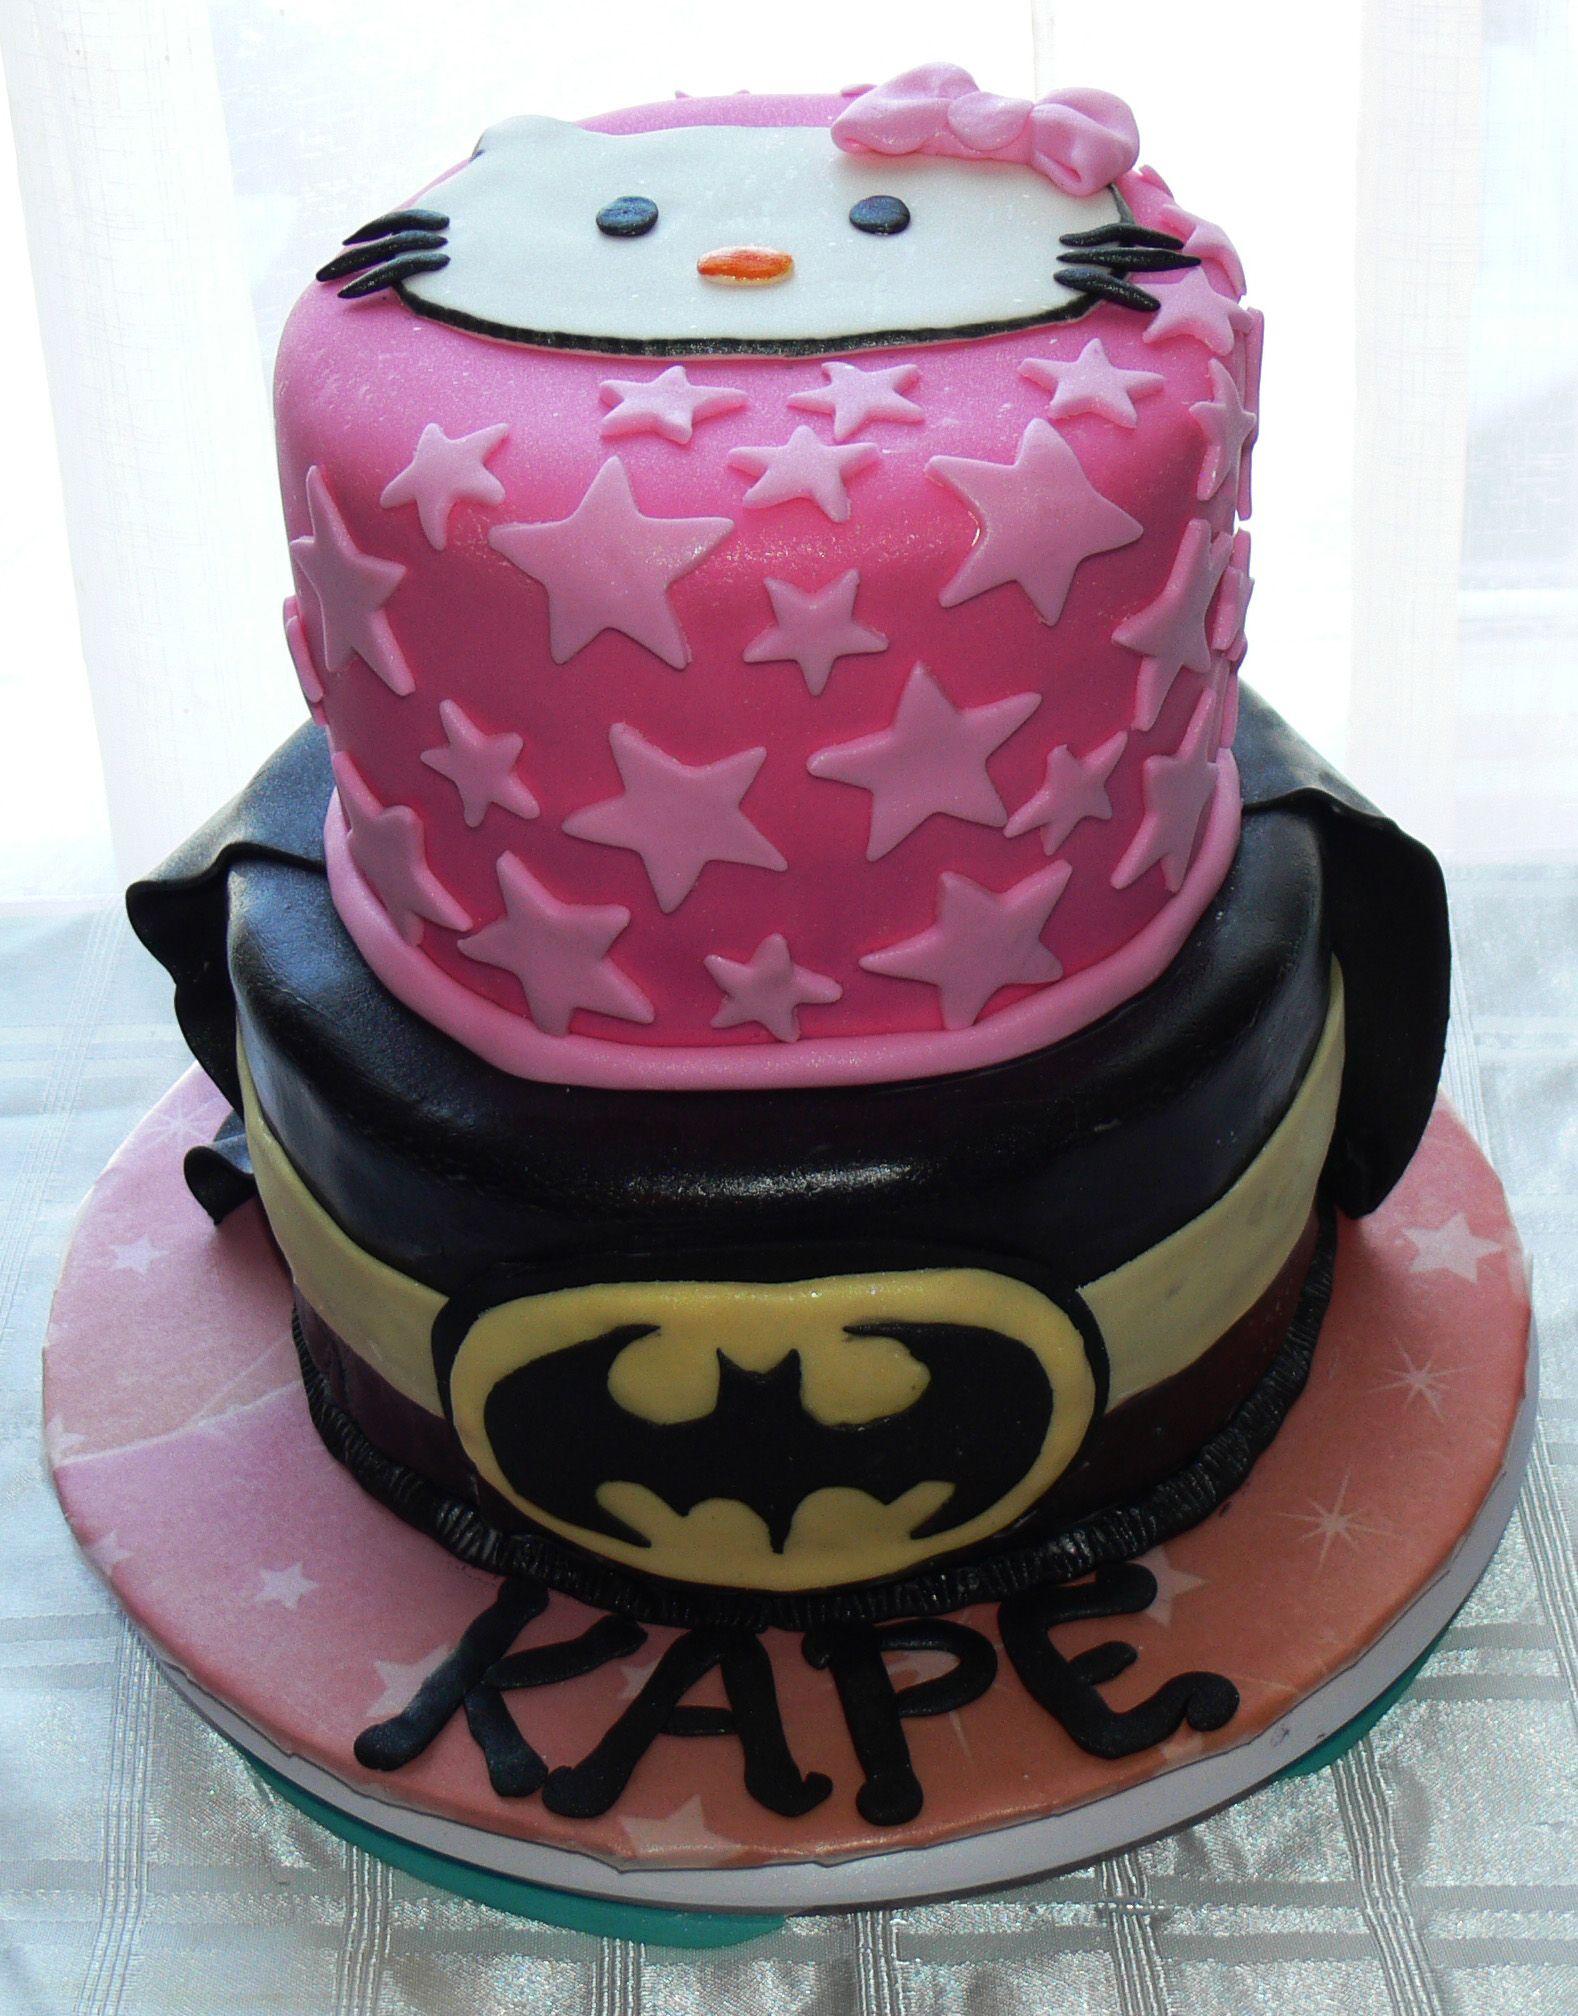 Favorite Things Birthday Cake Hello Kitty And Batman Www - Favorite birthday cake